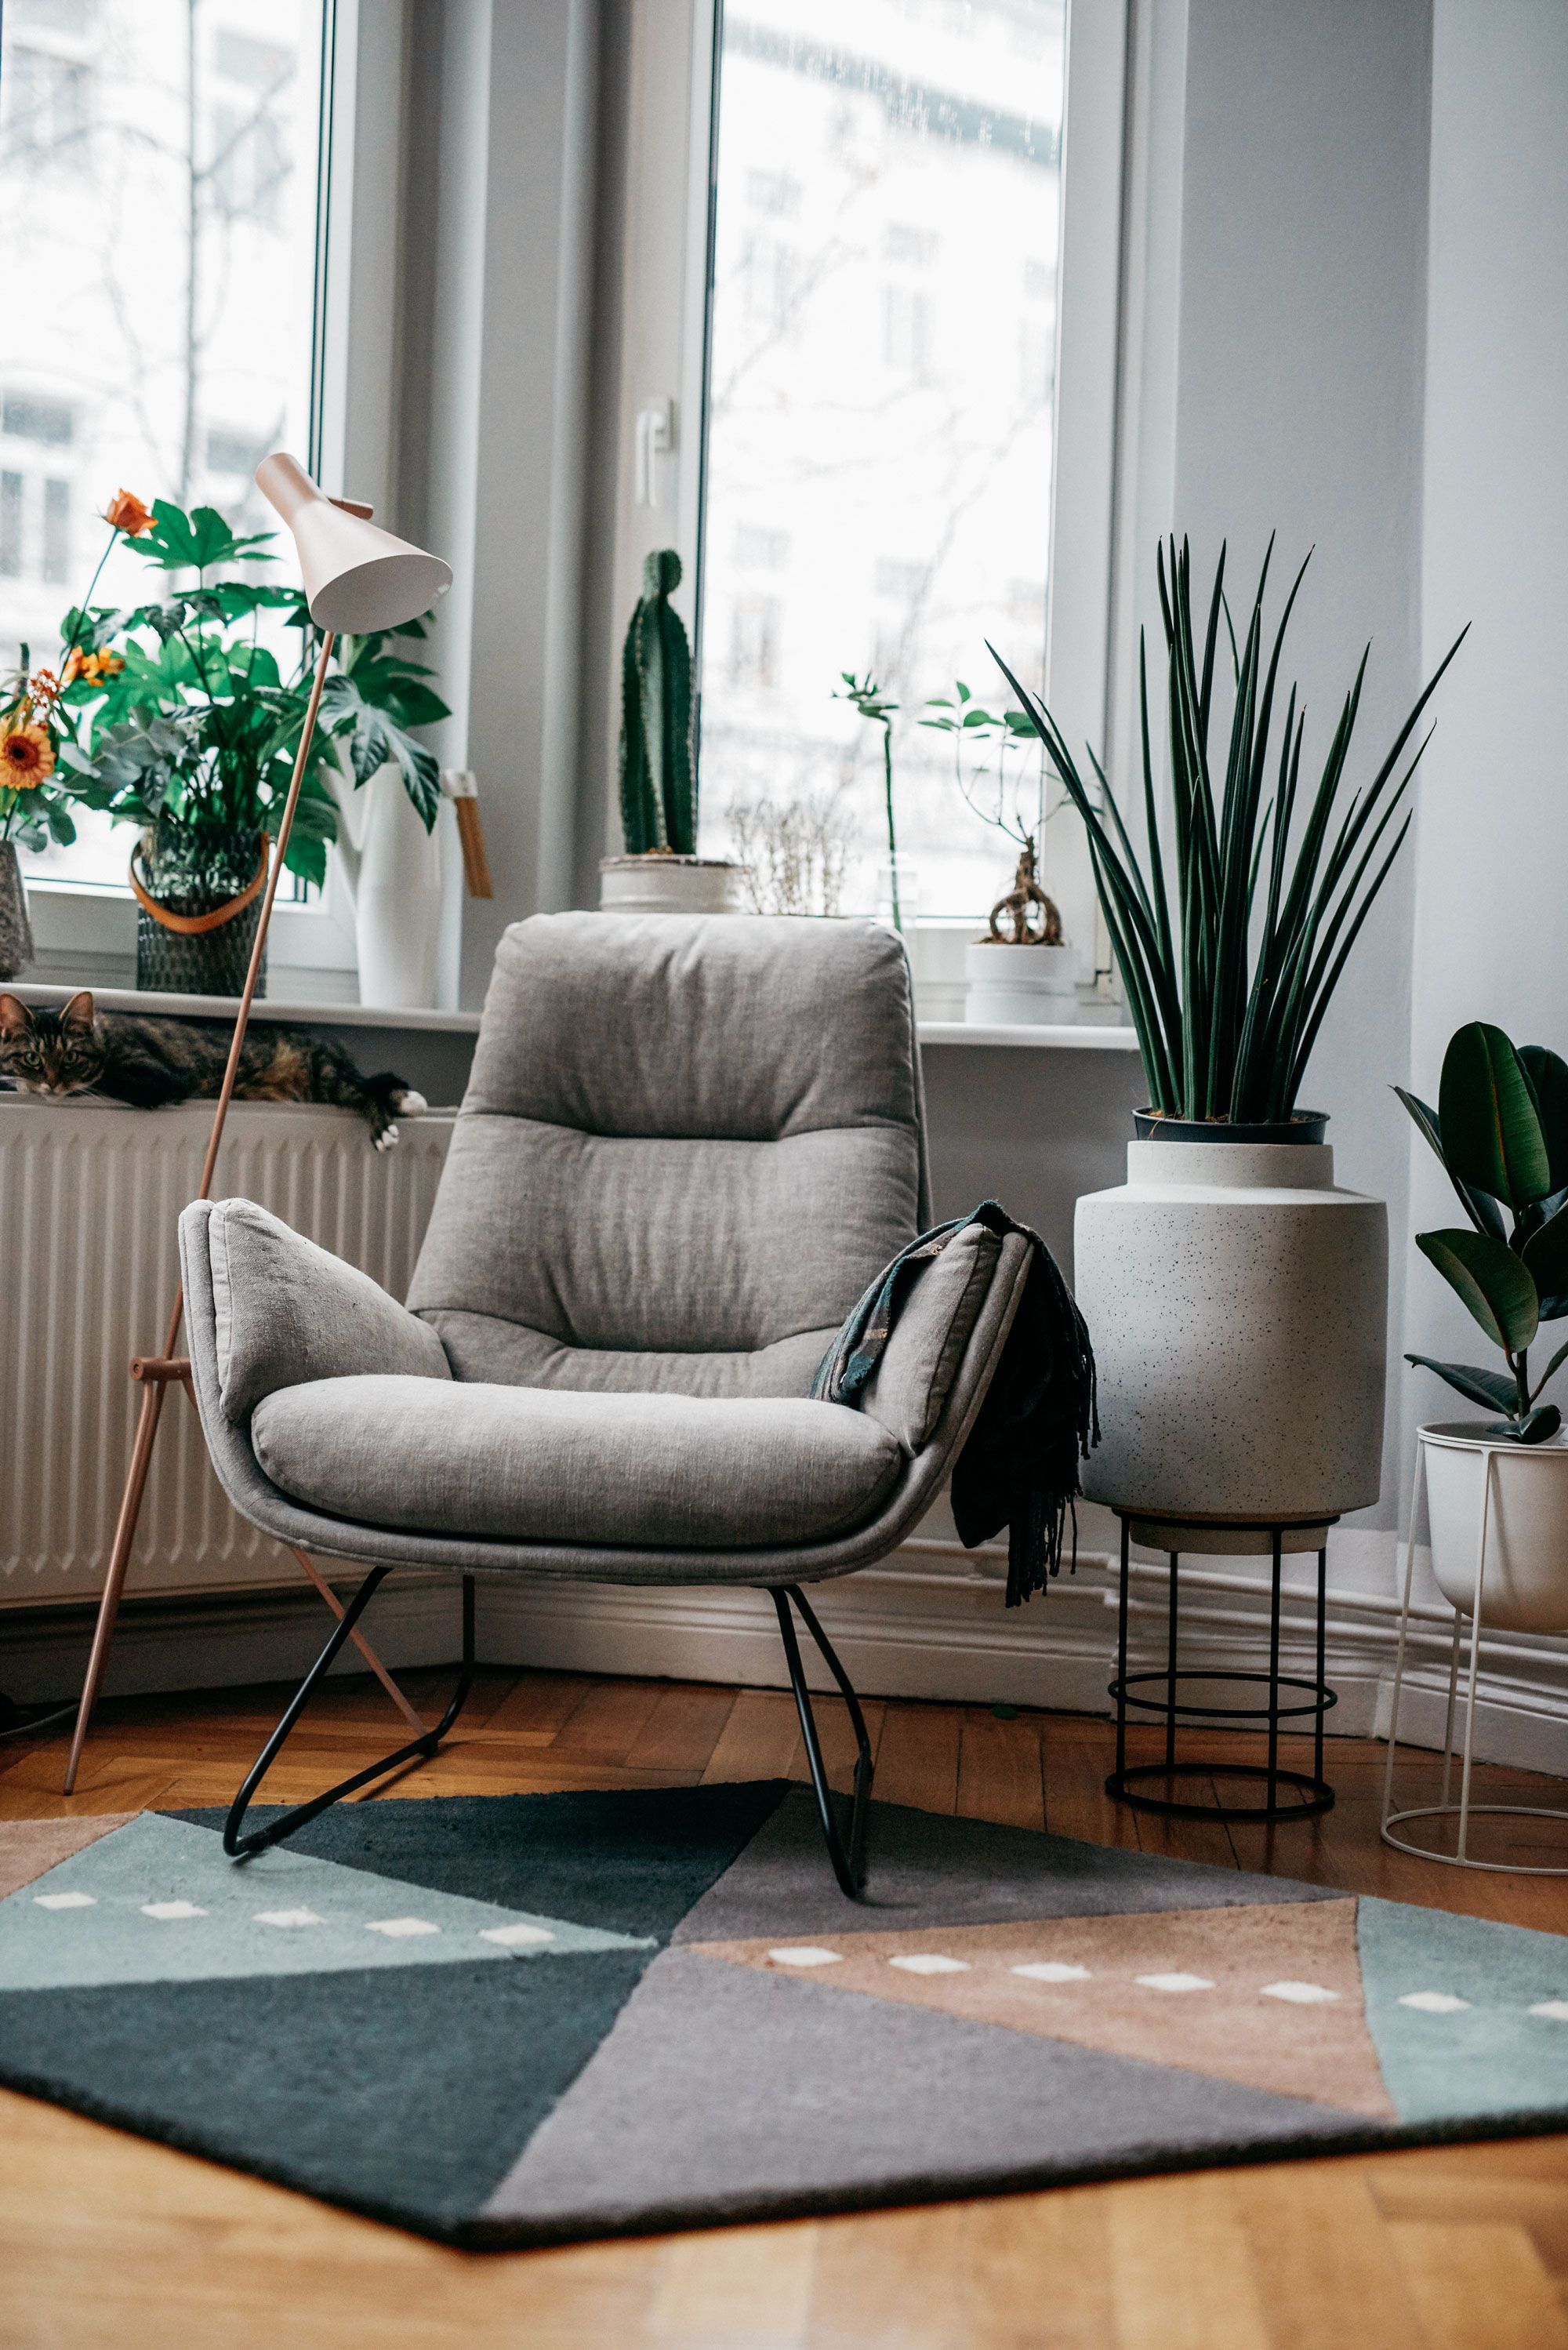 Masha Sedgwick Apartment Location Berlin Mitte Germany Blogger